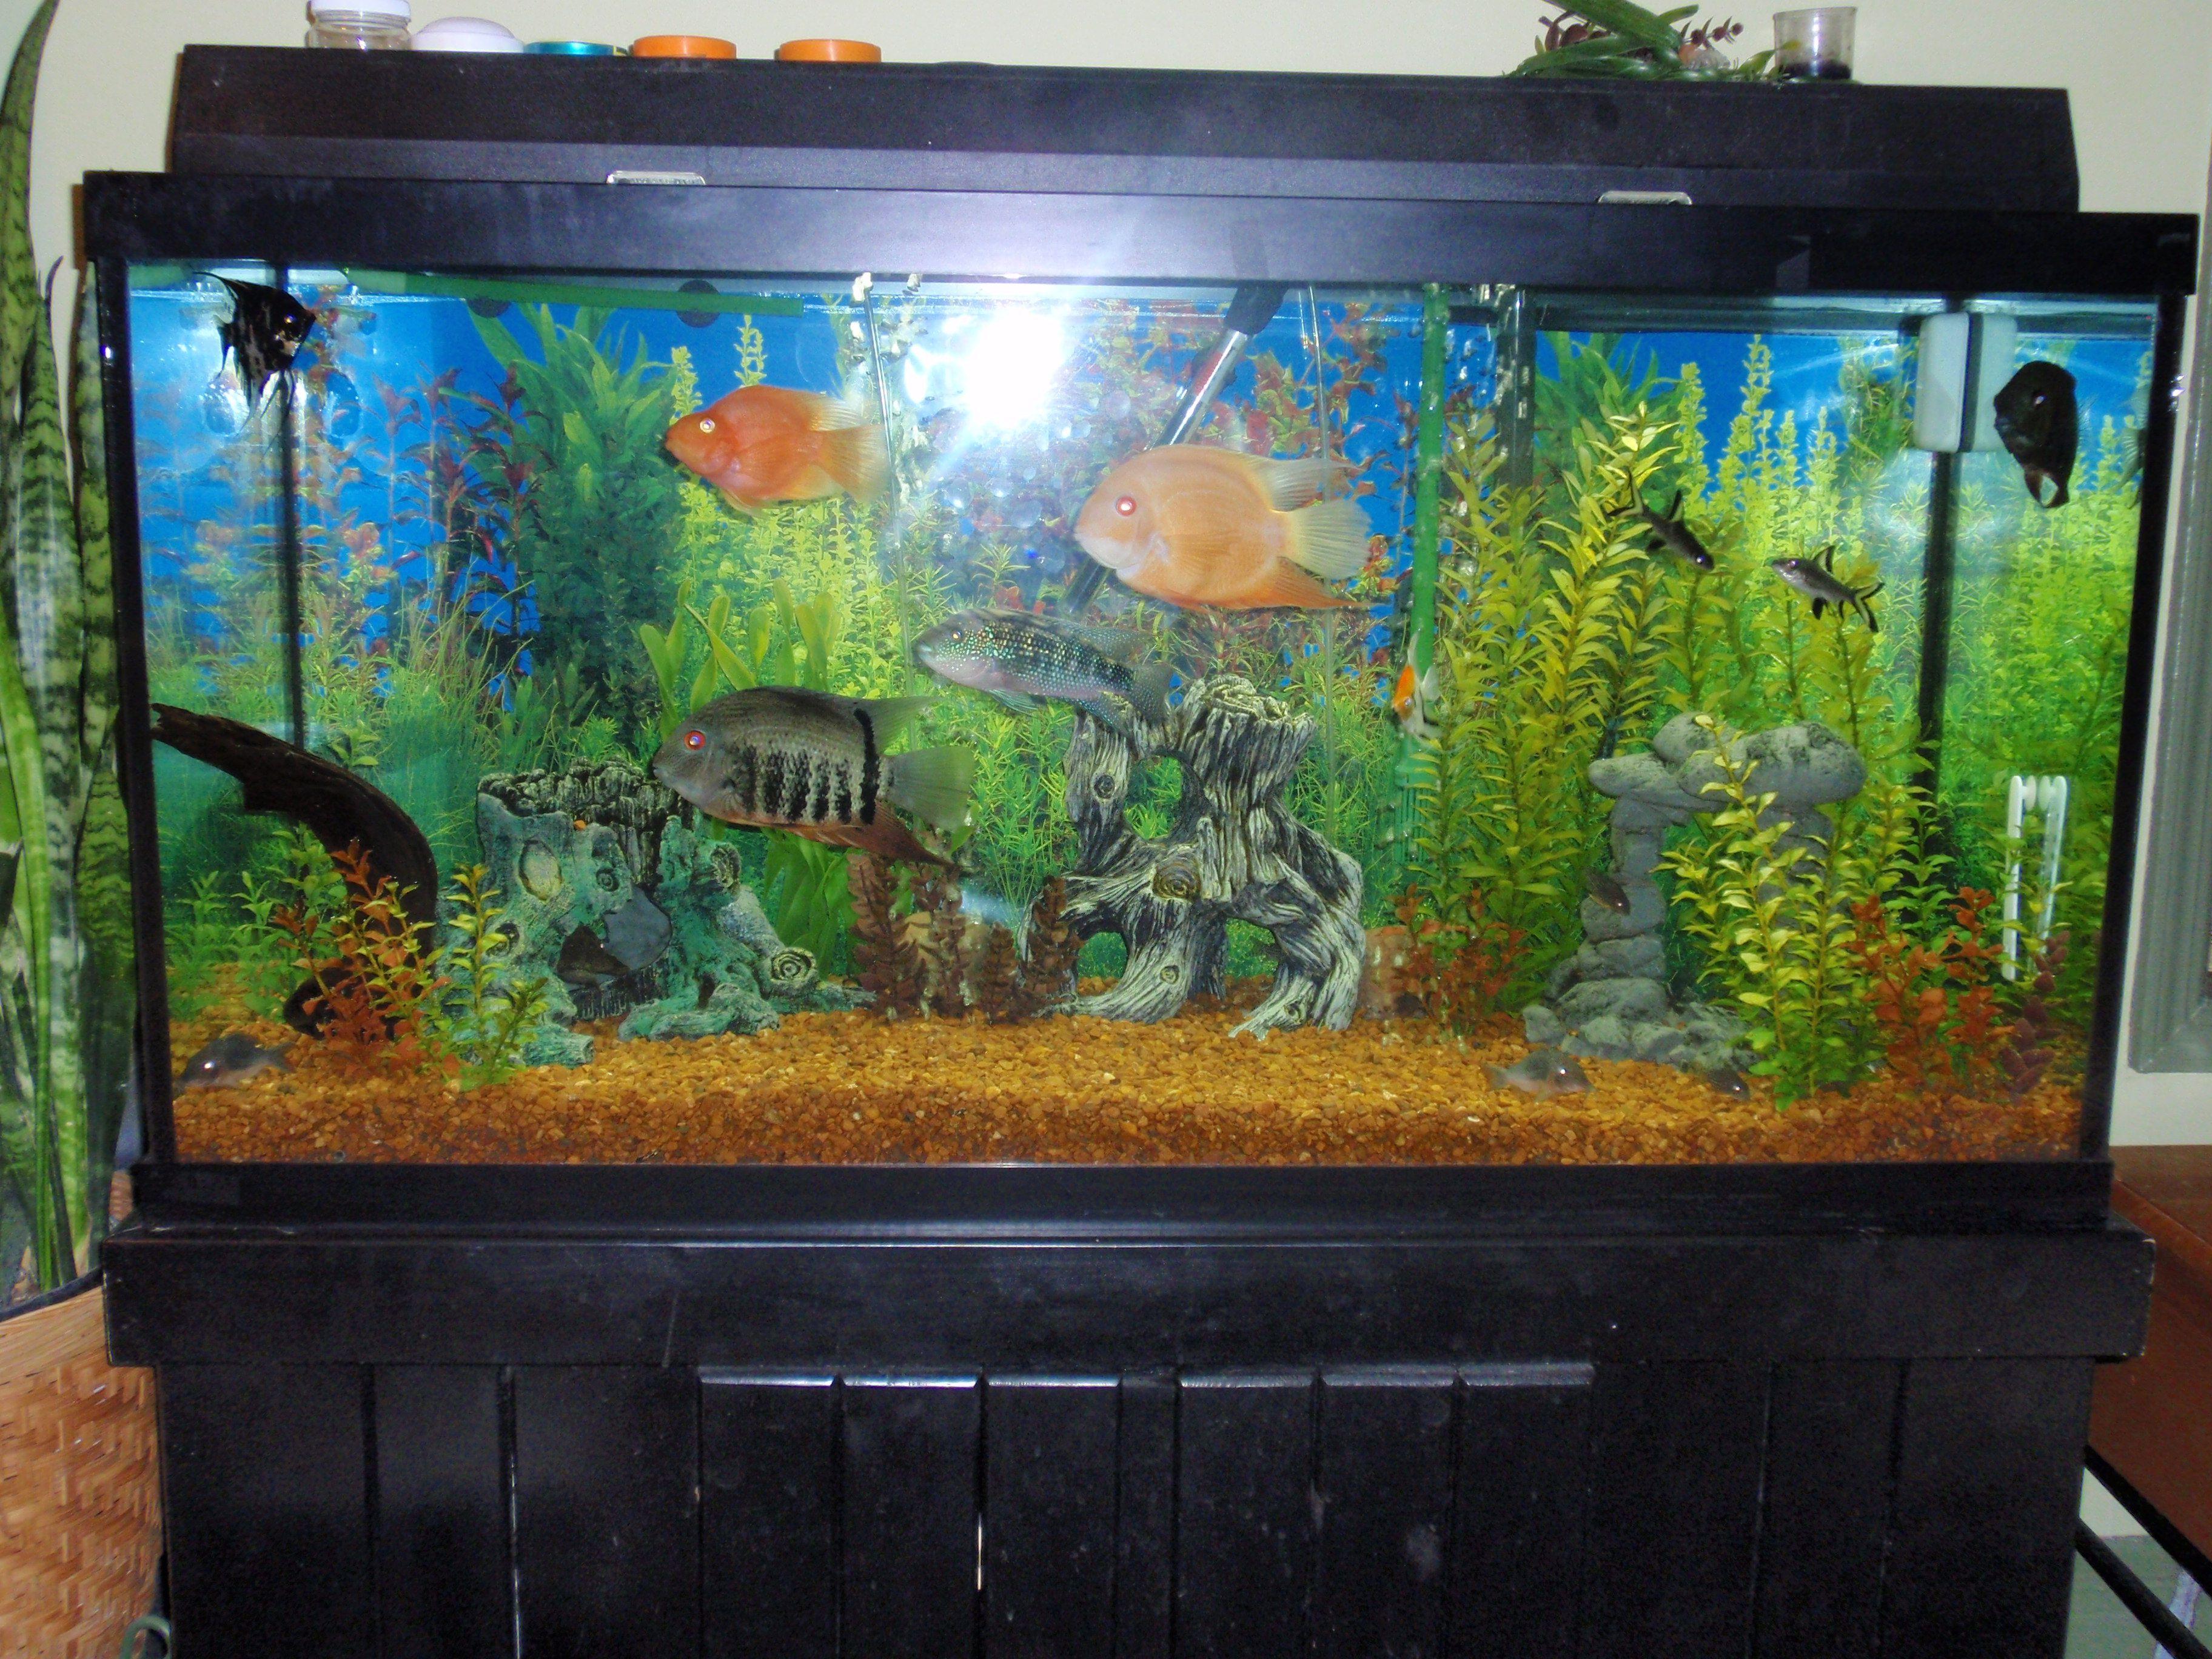 90 gallon aquarium setup 1000 aquarium ideas for 90 gallon fish tank dimensions